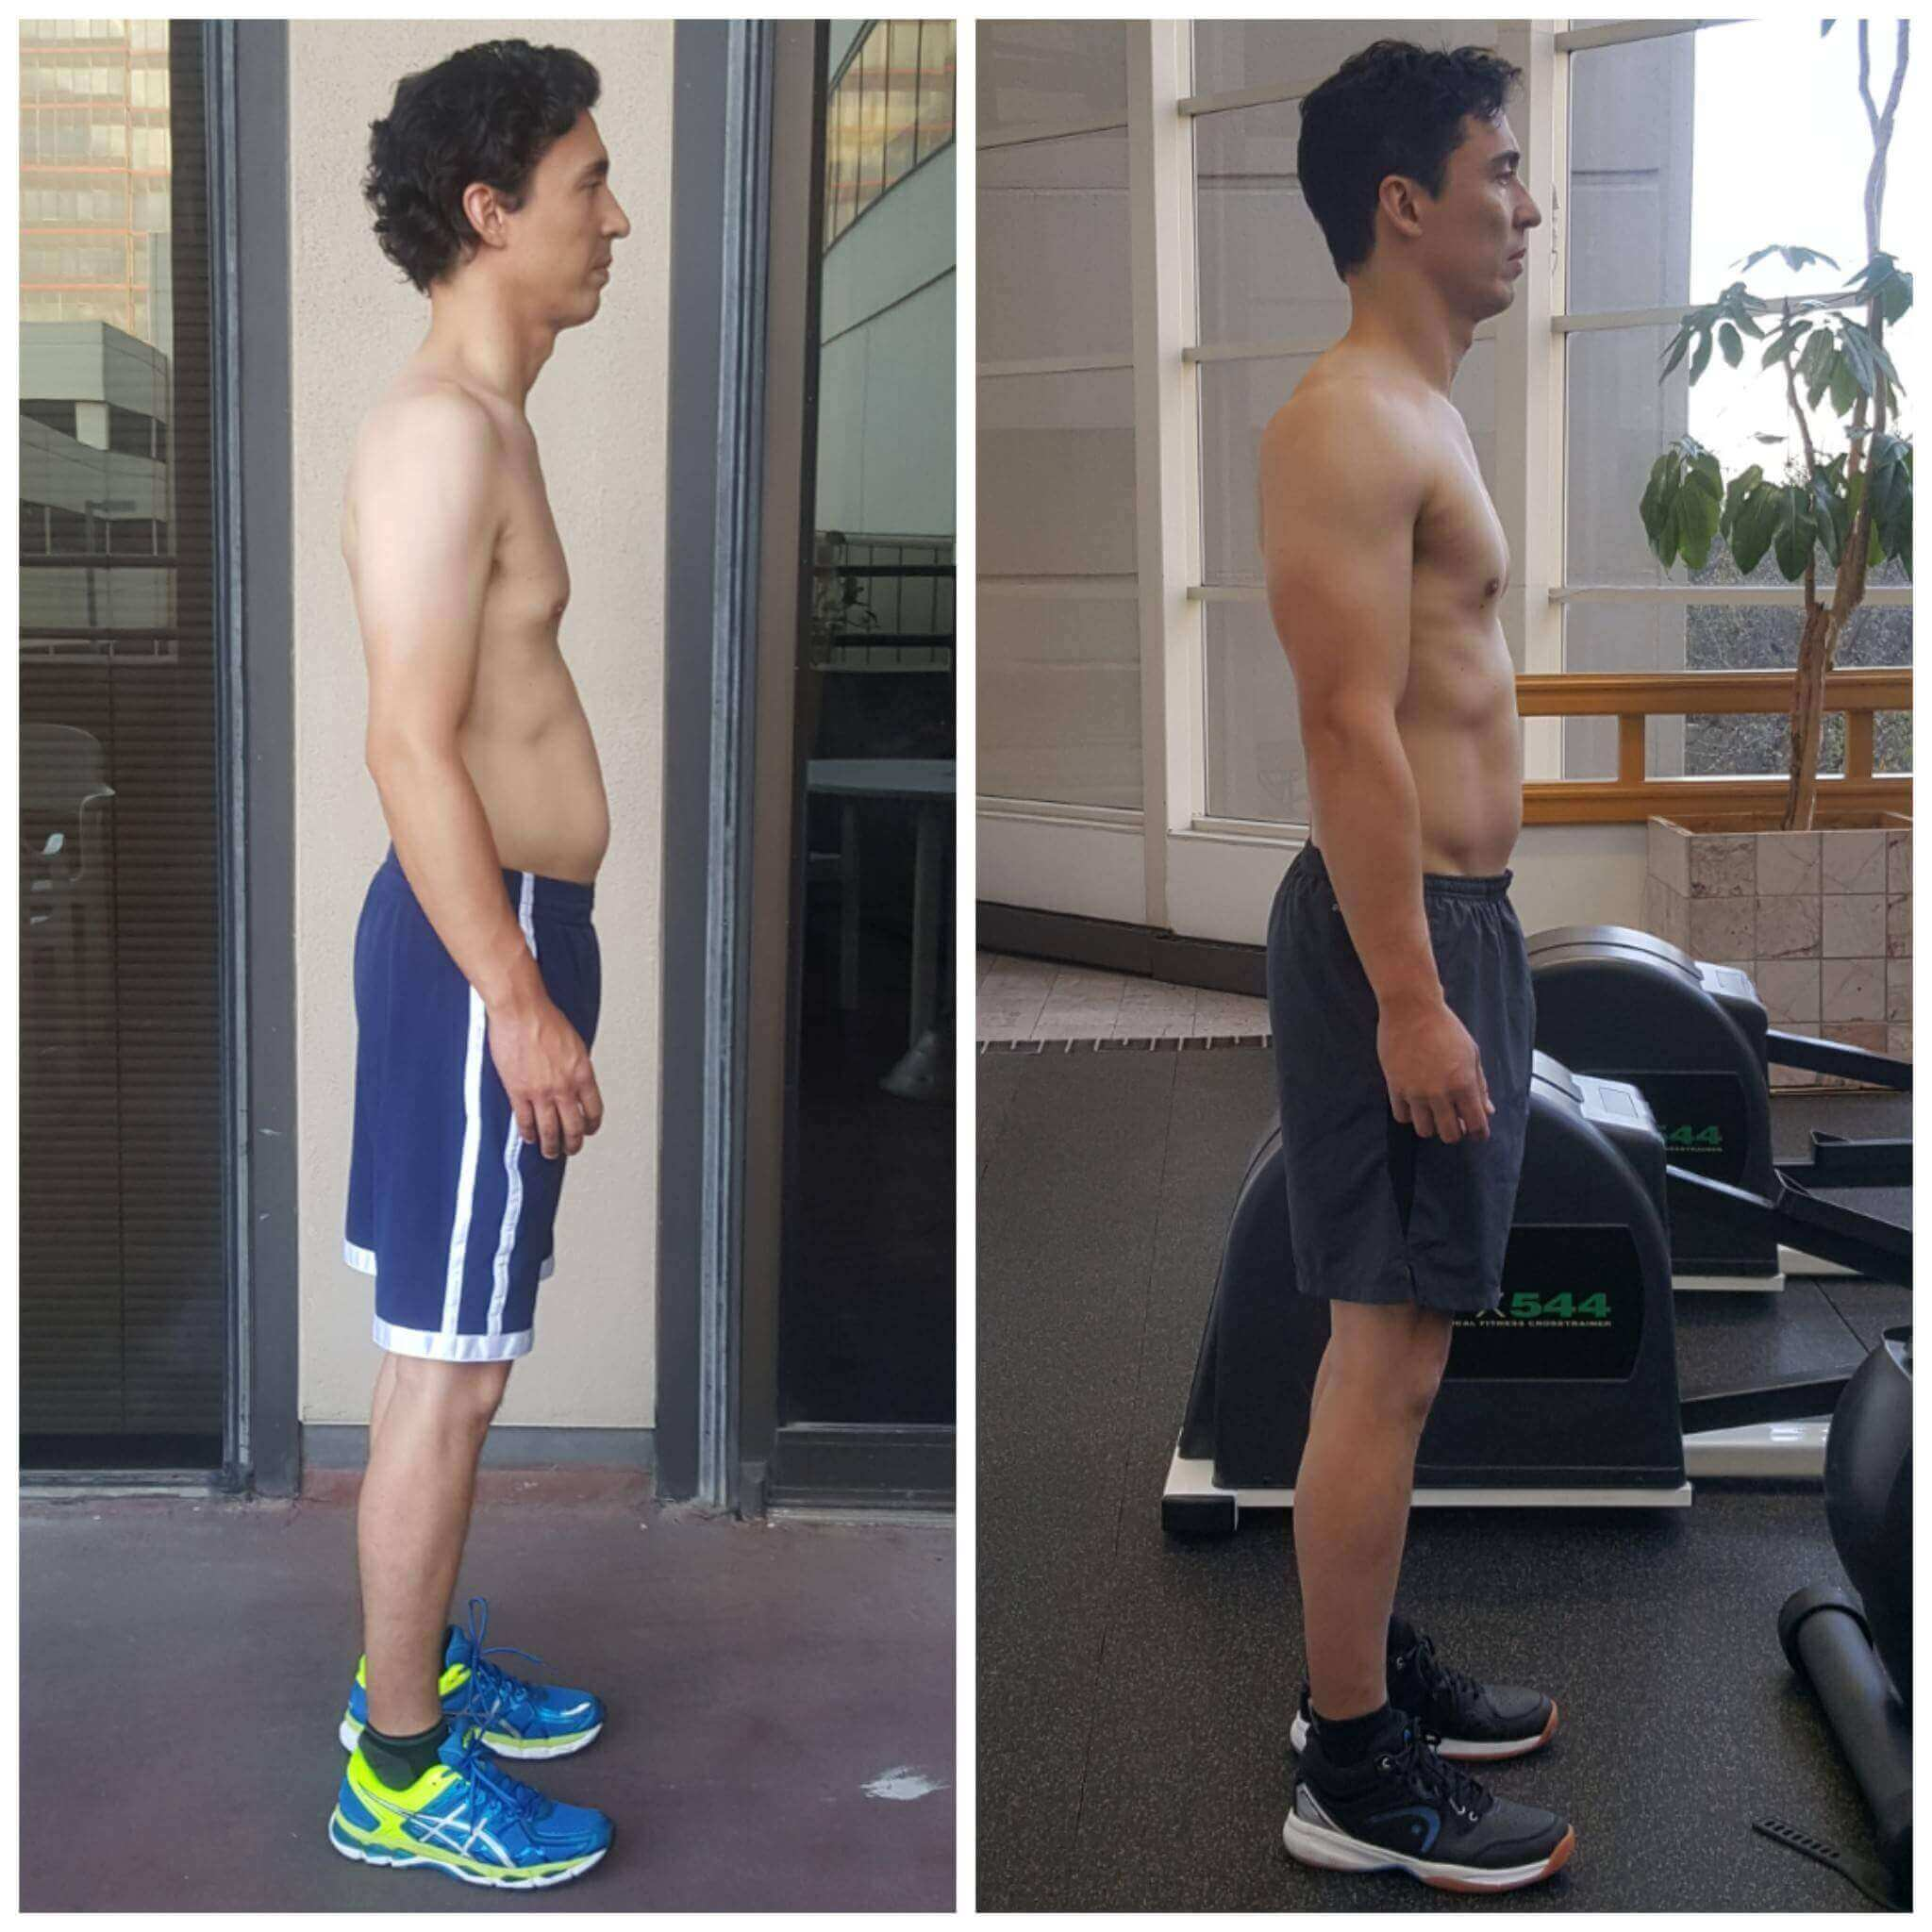 Hugh muscle building trainer Dallas